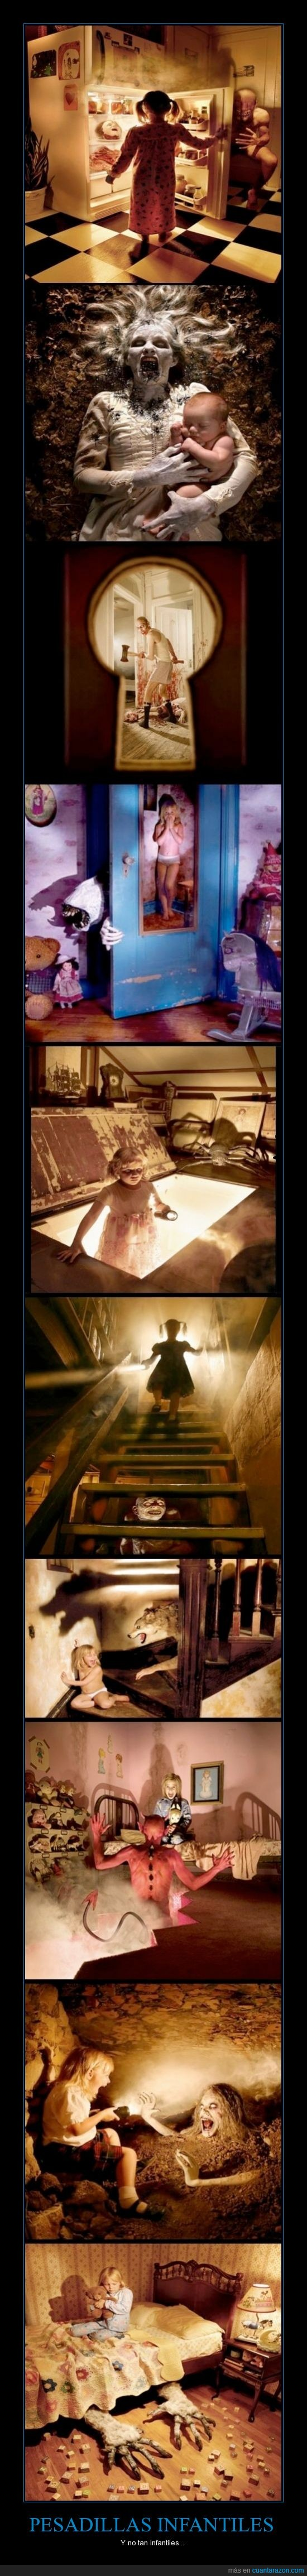 cama,escalera,Joshua Hoffine,miedo,monsters inc.,monstruos,niño,pesadillas